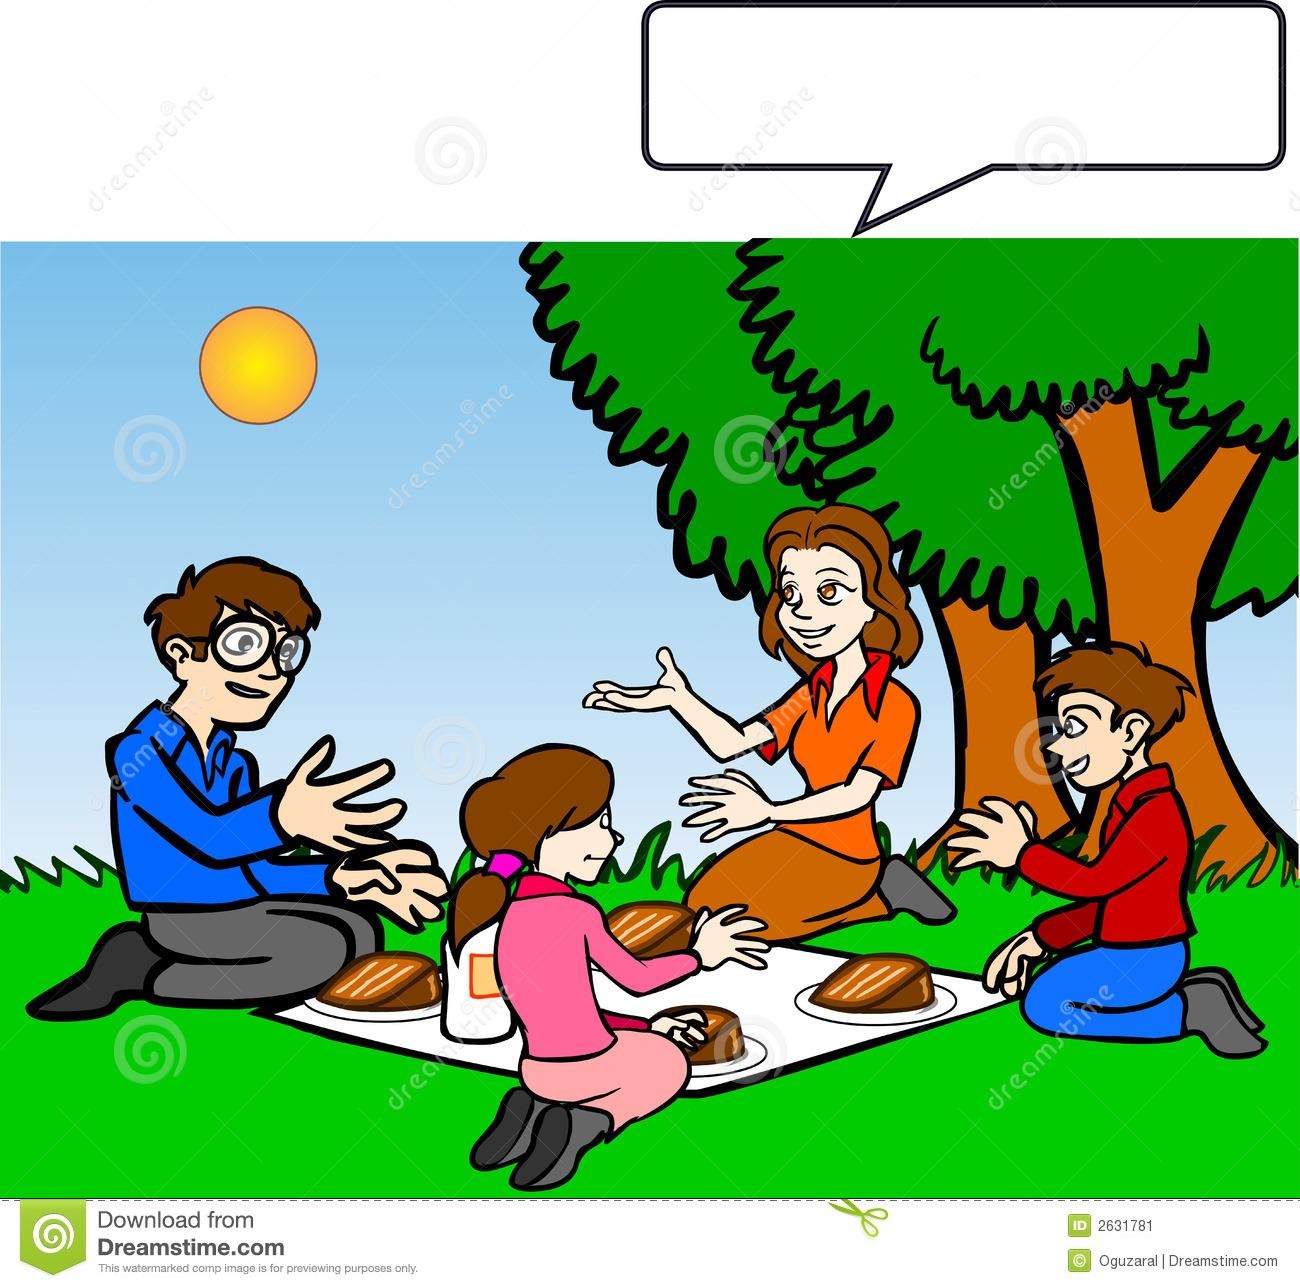 Picnic clipart picnic park Clipart Picnic Images Company company%20picnic%20images